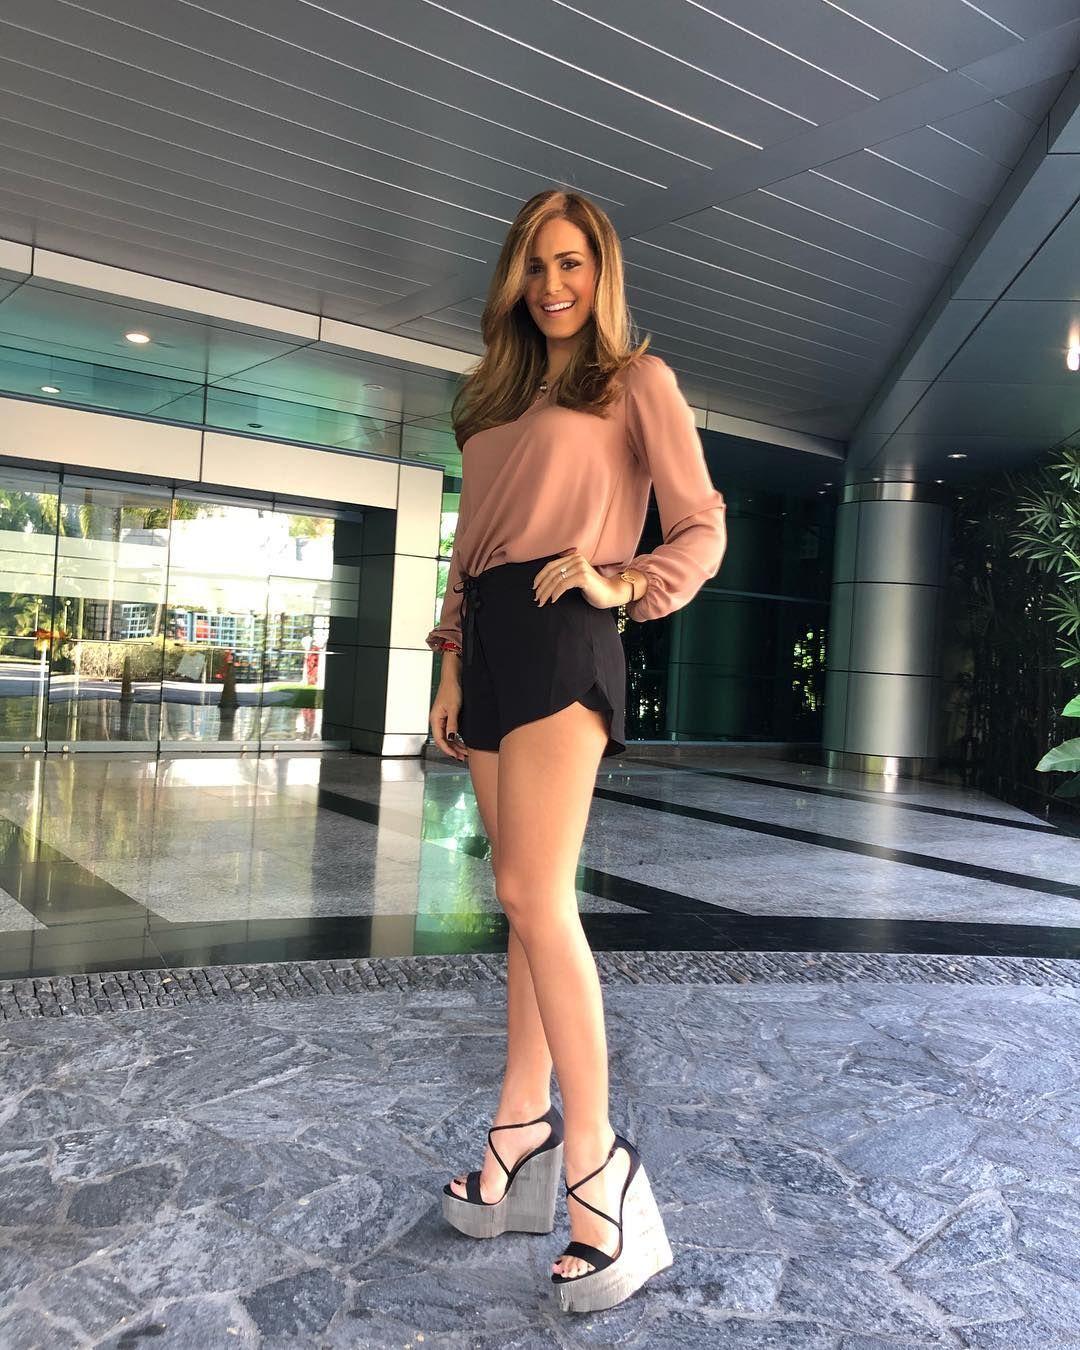 Debora Menicucci nudes (74 pics) Bikini, Instagram, cameltoe